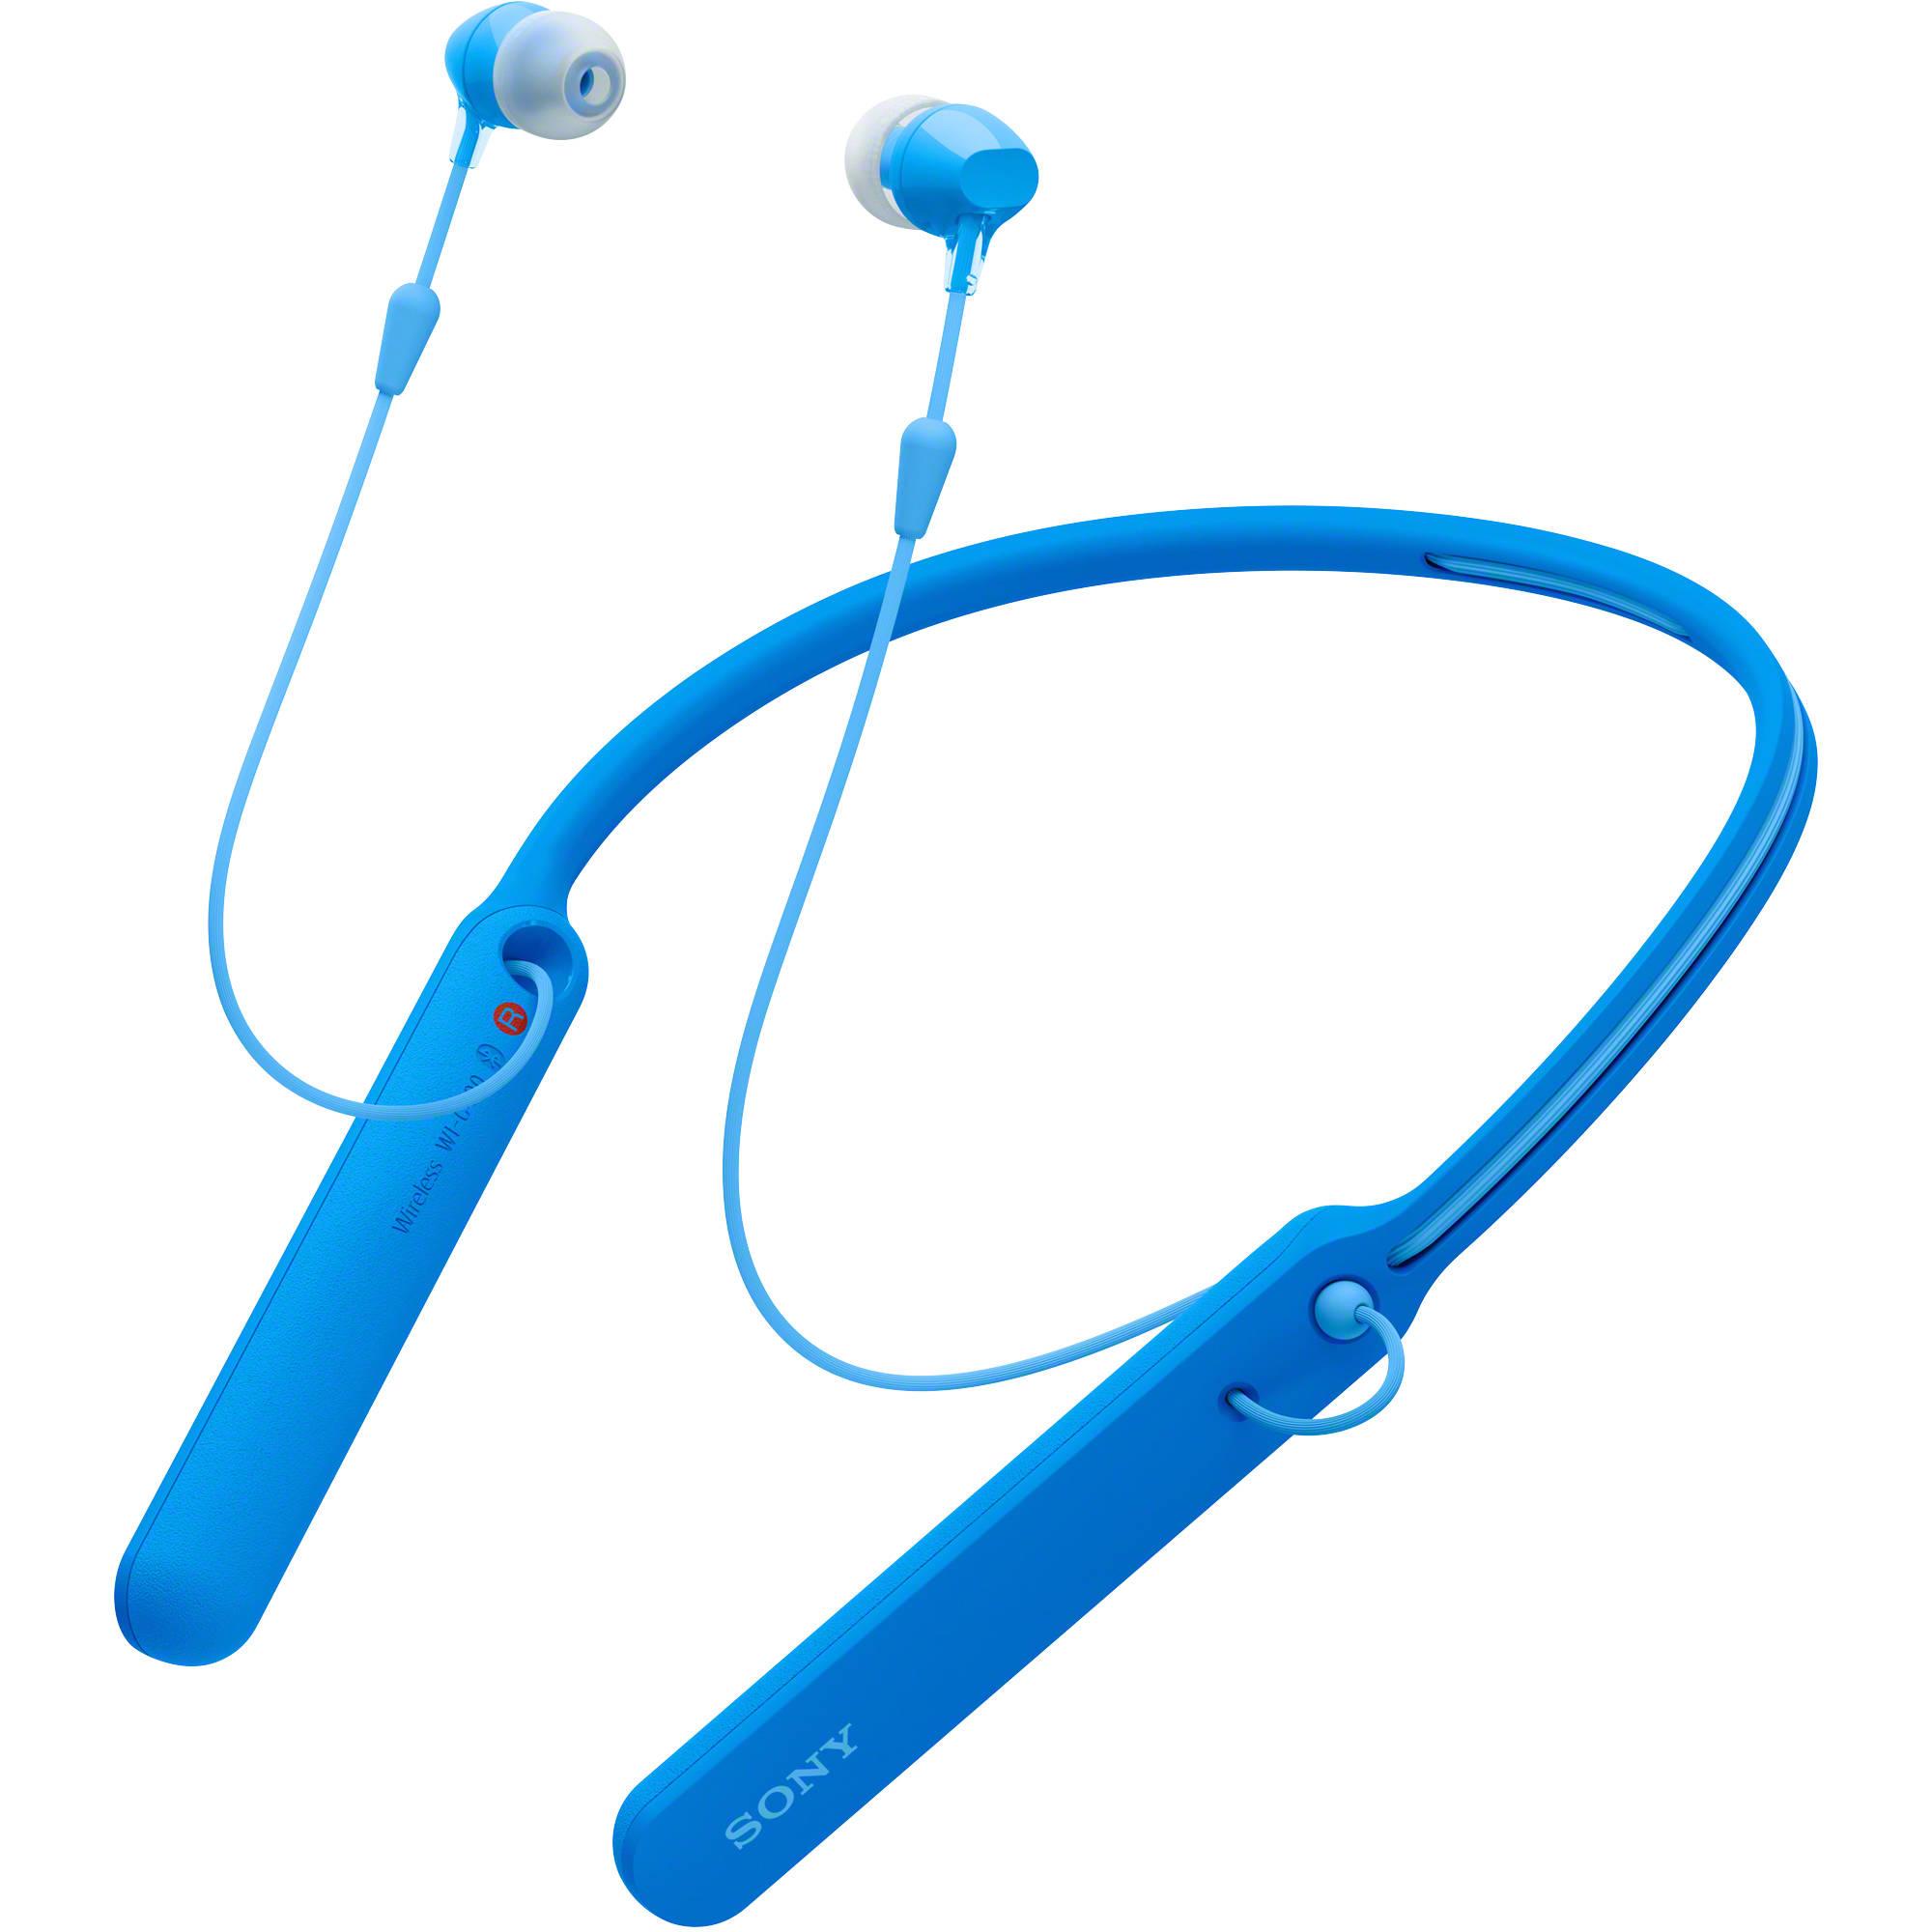 Sony wireless headphones c400 - wireless headphones jbl